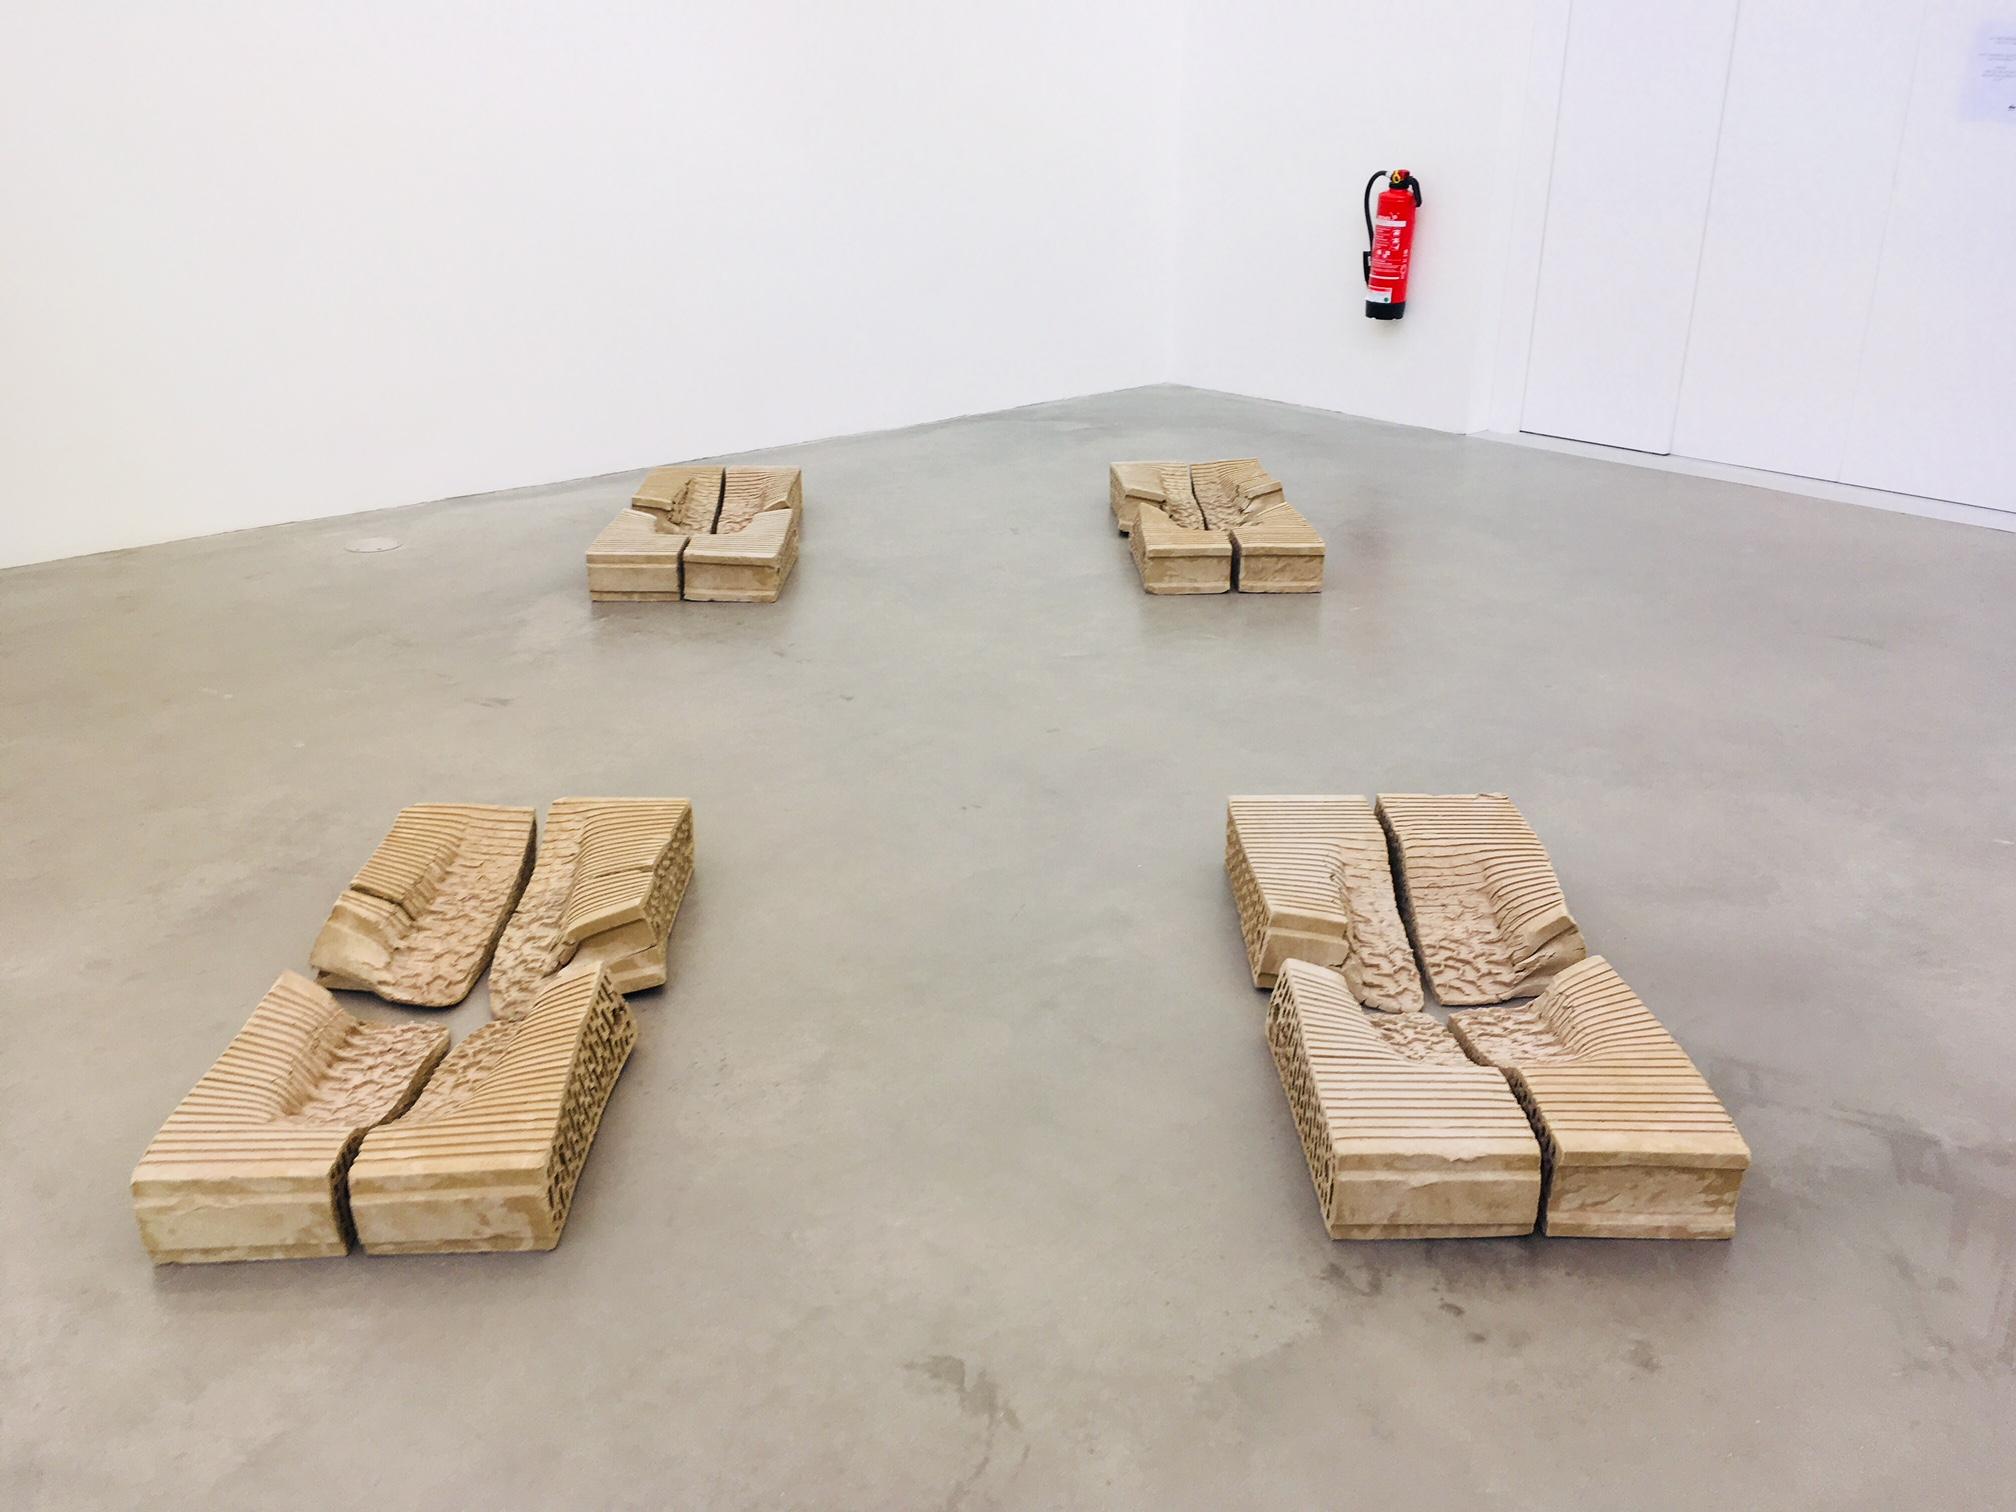 Bricks, 2018, Taiyo Onorato & Nico Krebs, Defying Gravity, photo © #HorstundEdeltraut